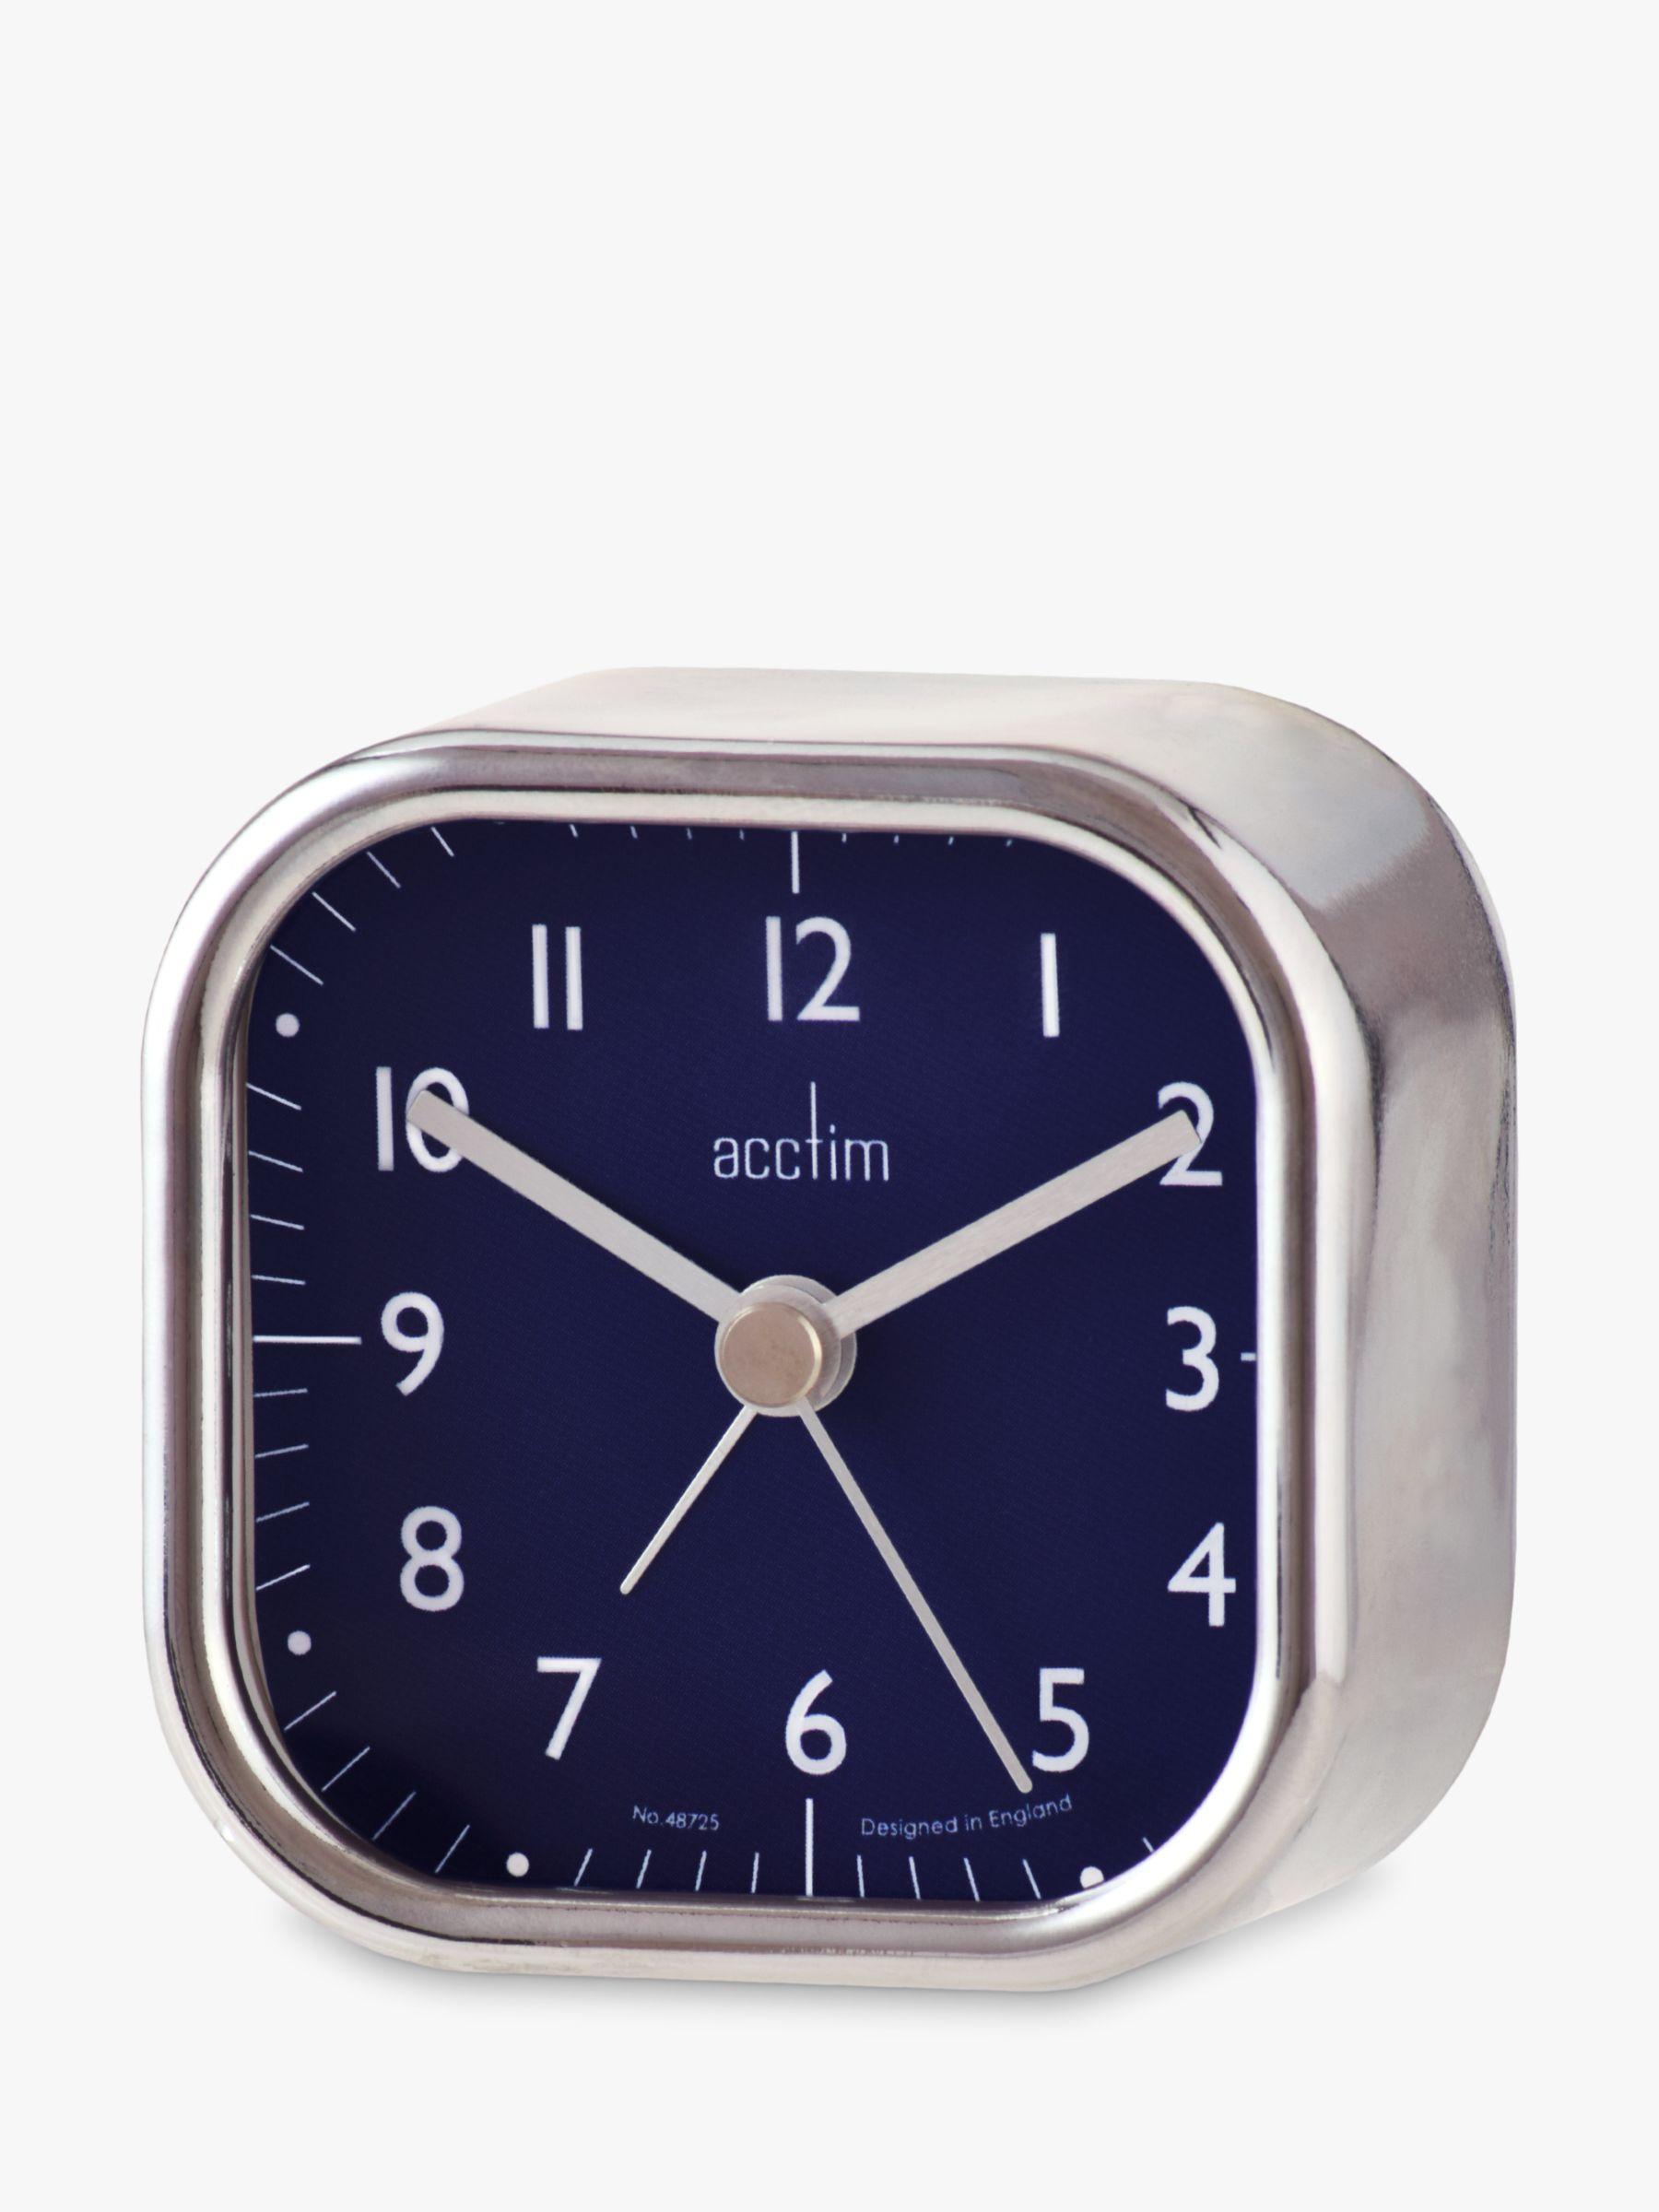 Acctim Acctim Zak Analogue Alarm Clock, 7cm, Chrome